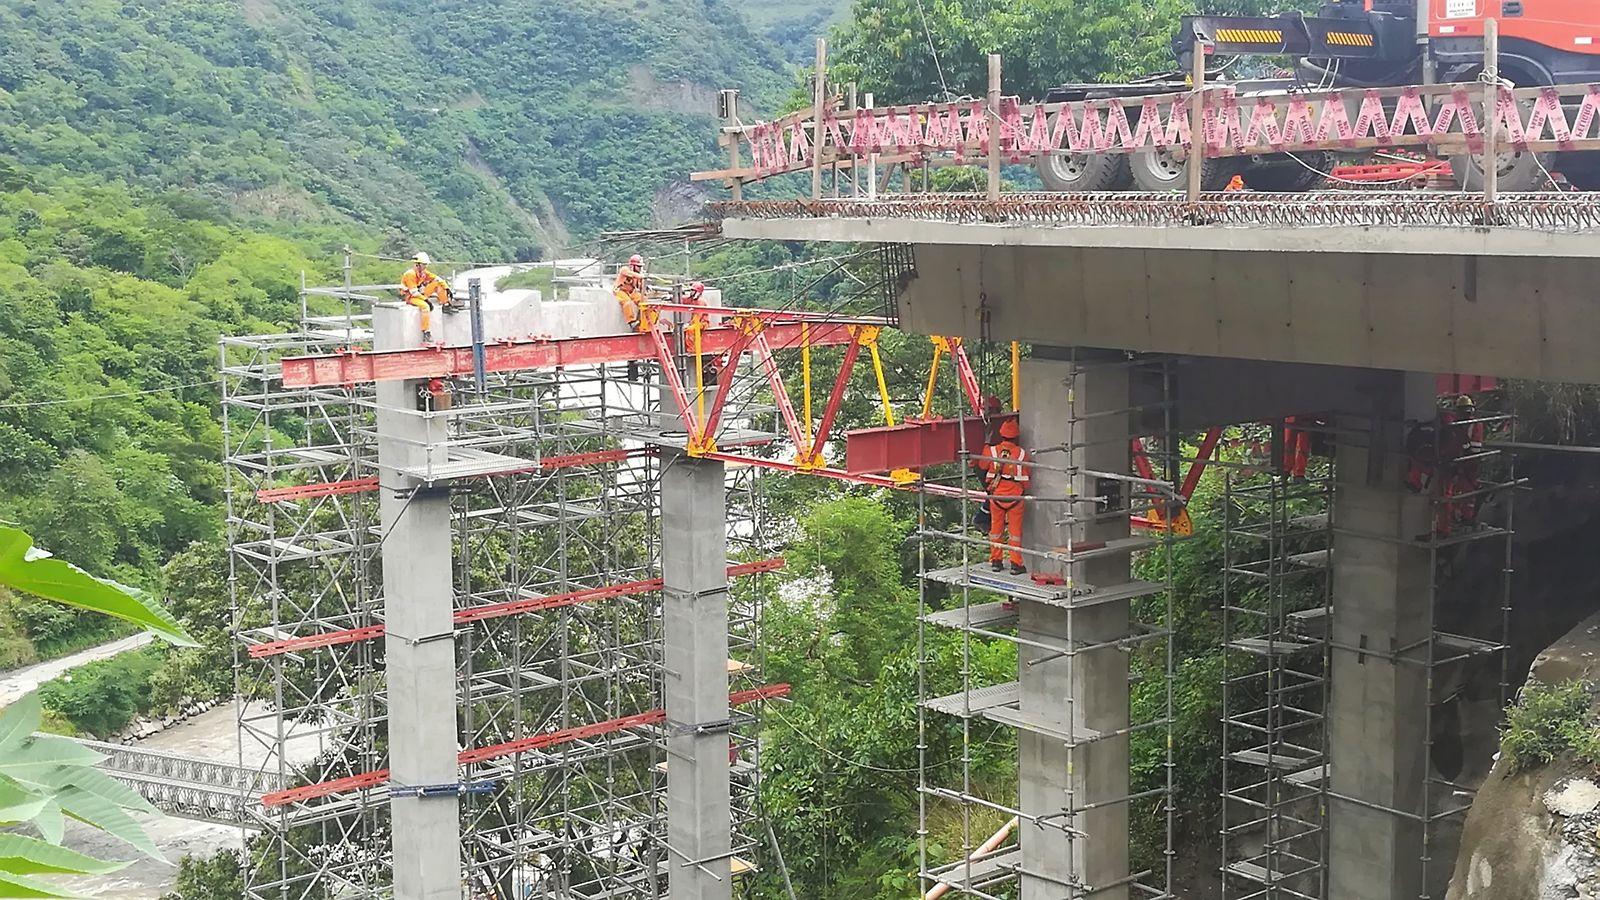 puente maranura, cusco